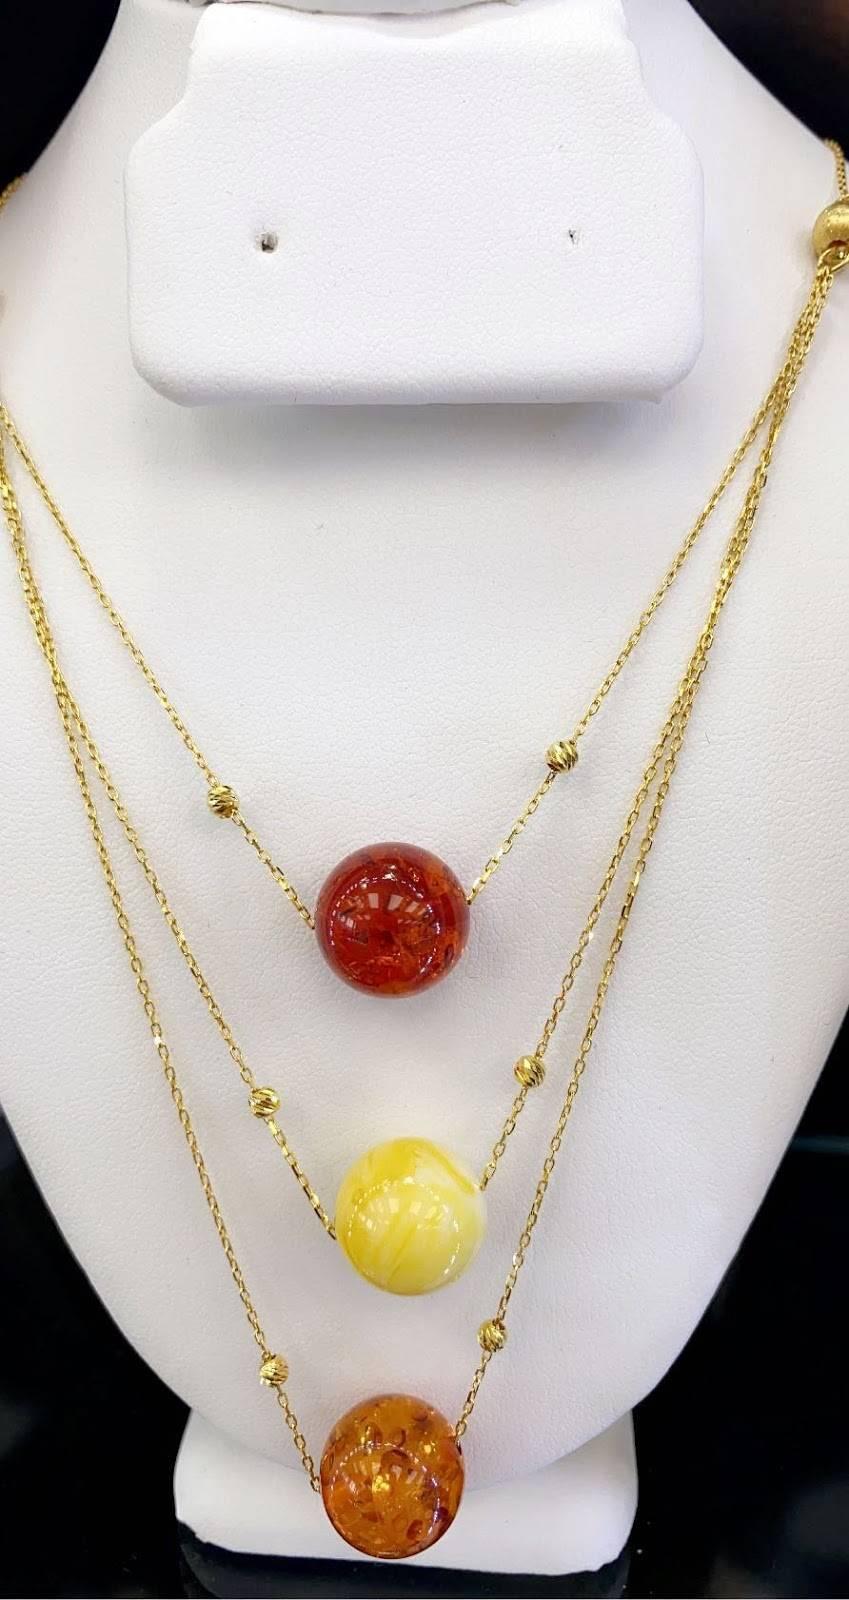 Queen jewelry - jewelry store  | Photo 9 of 10 | Address: 4064 E 14 Mile Rd, Warren, MI 48092, USA | Phone: (586) 303-2991